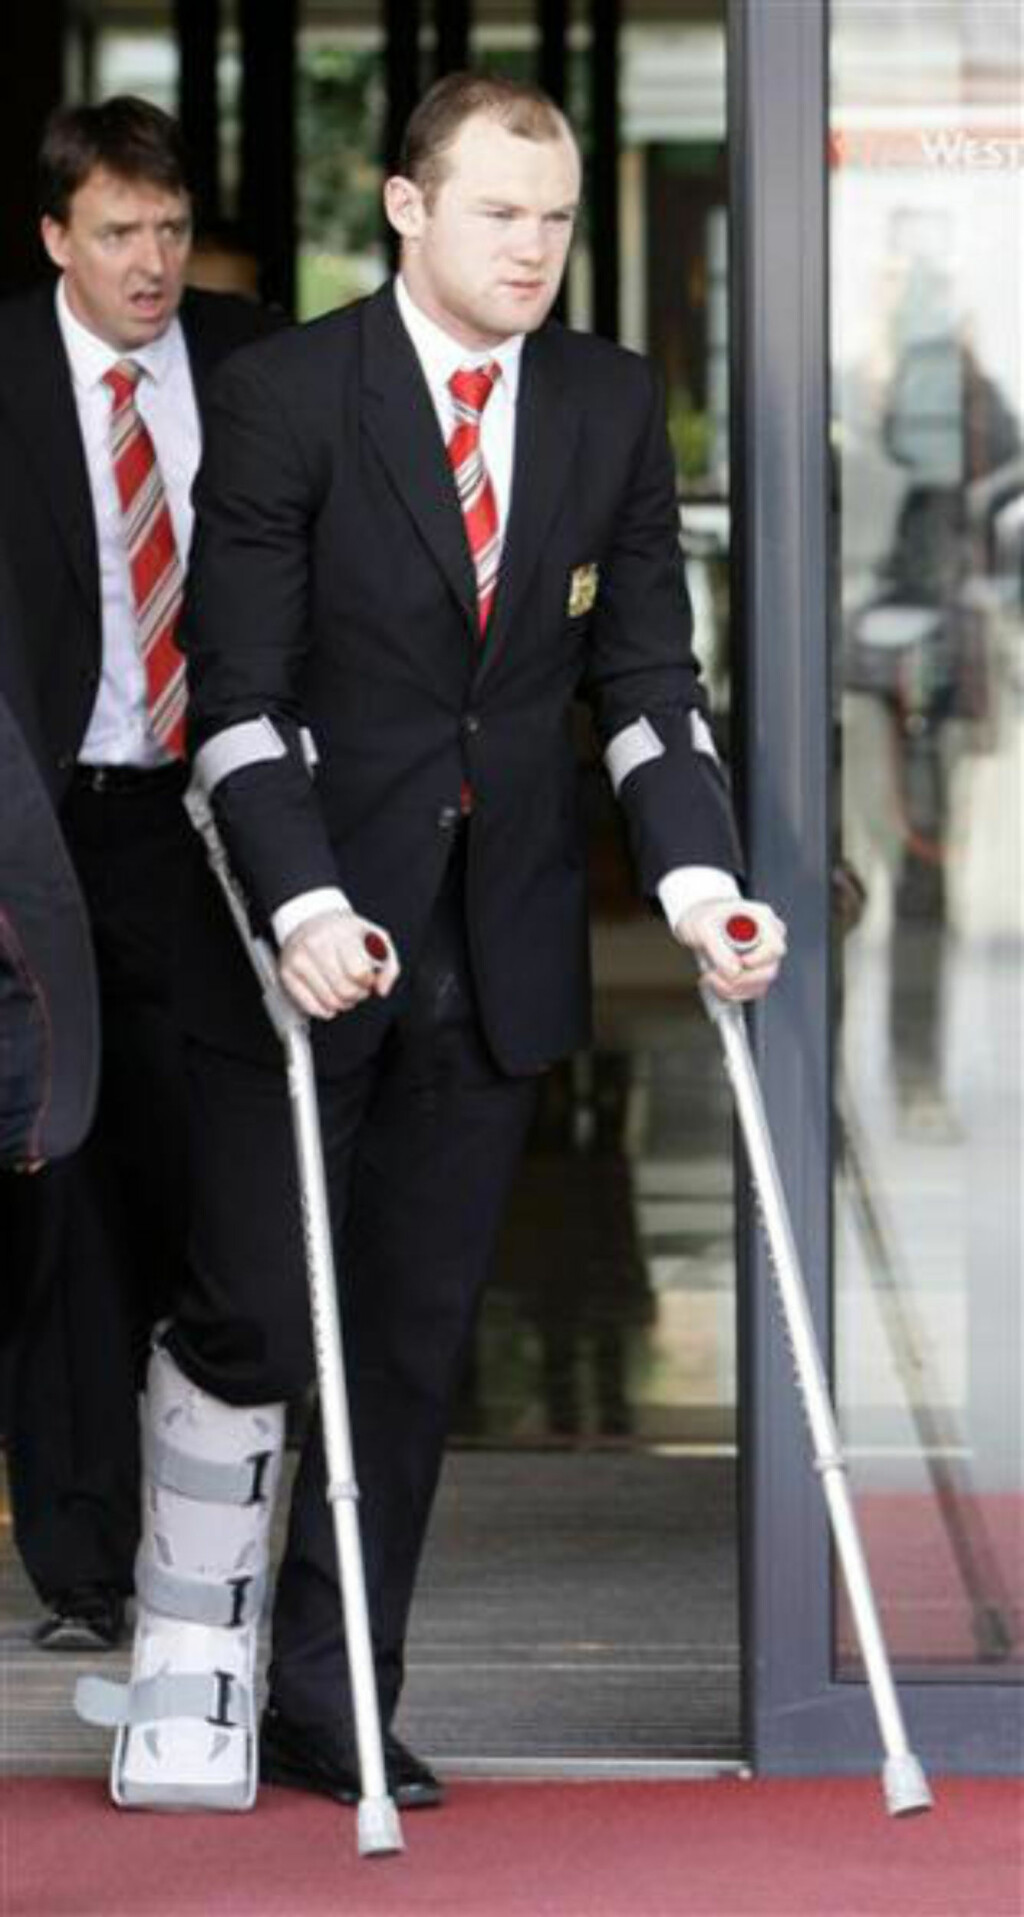 SKAVANKEL: Wayne Rooney må se dagens kamp fra sidelinja.Foto: SCANPIX/  REUTERS/Michaela Rehle